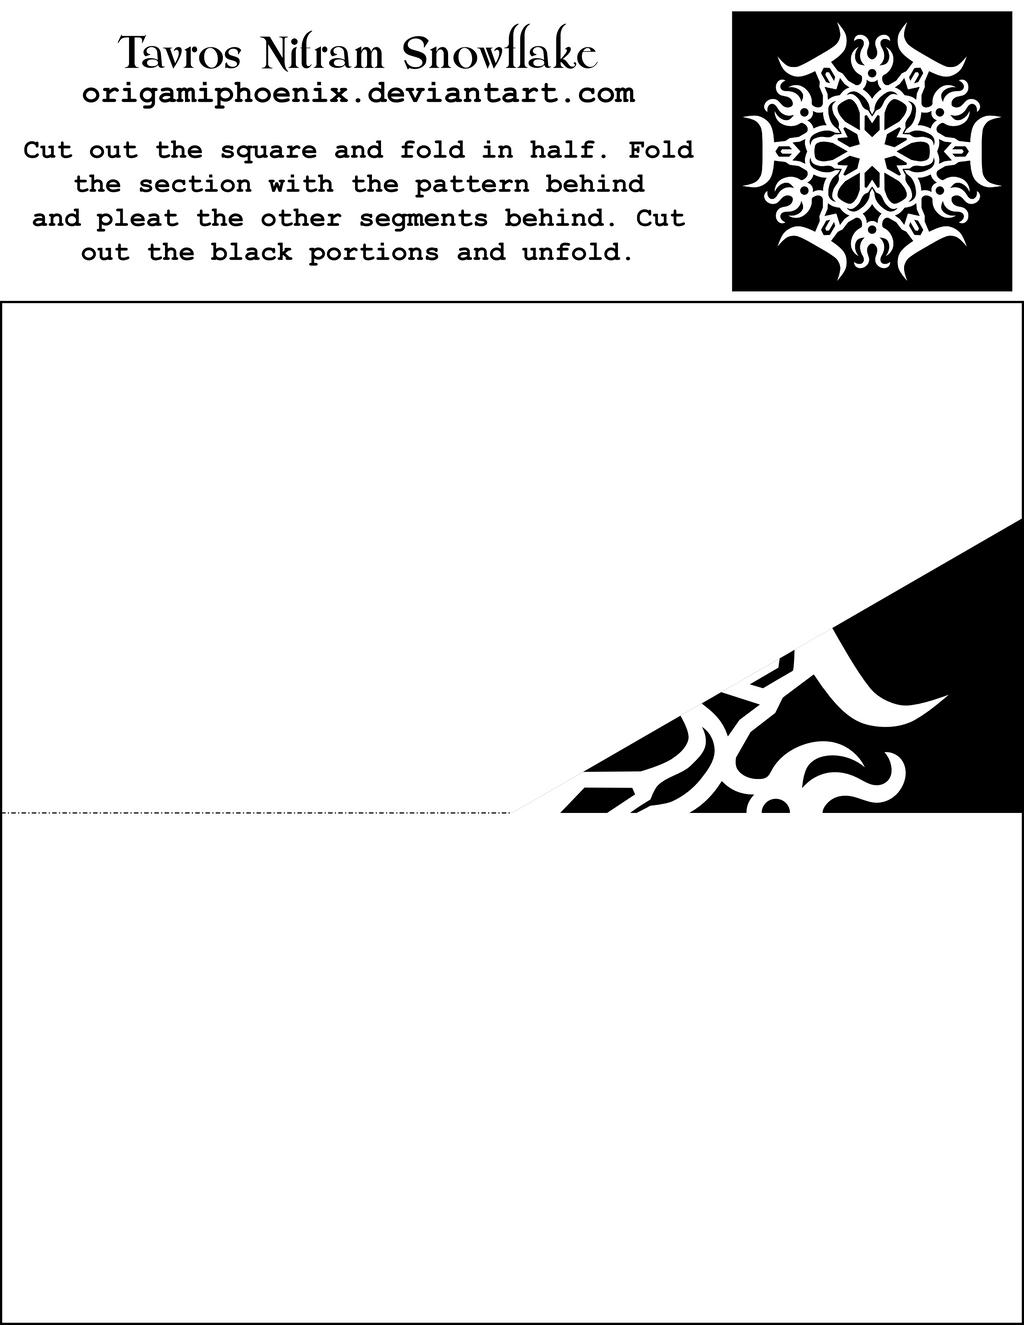 Tavros Nitram Snowflake PrintOut by OrigamiPhoenix on DeviantArt